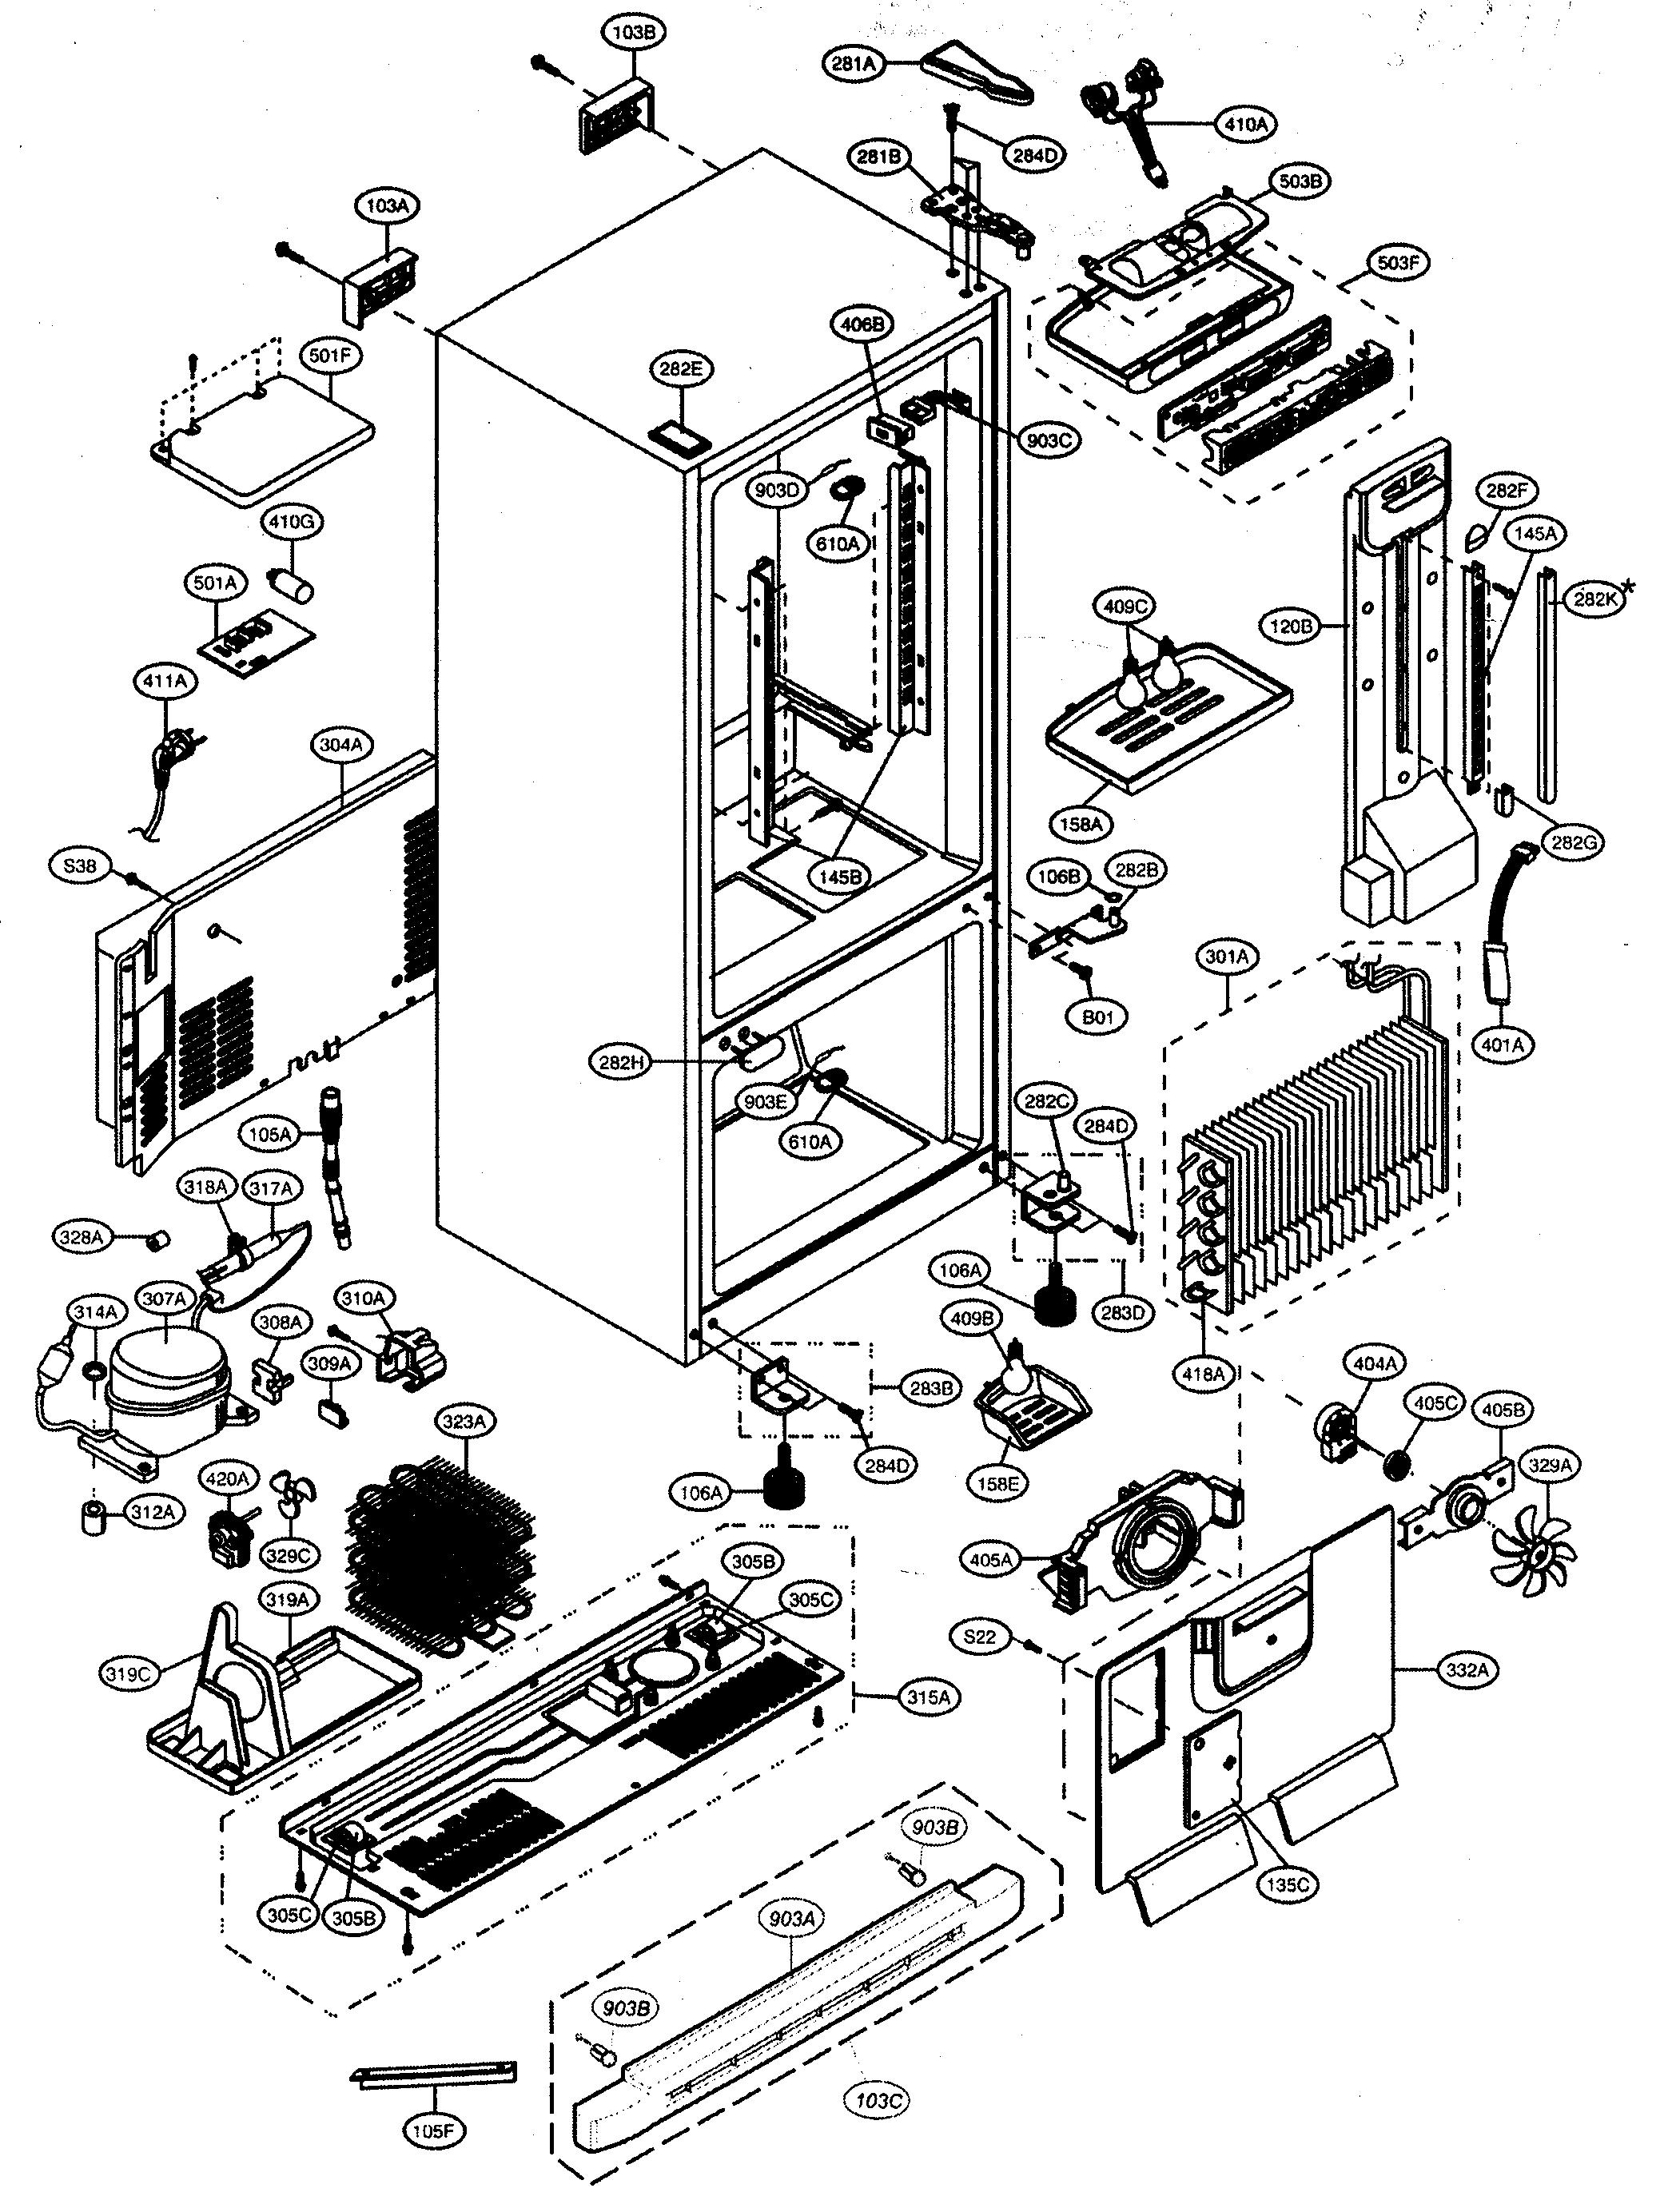 kenmore 795 65204 401 defrost heater sheath-element